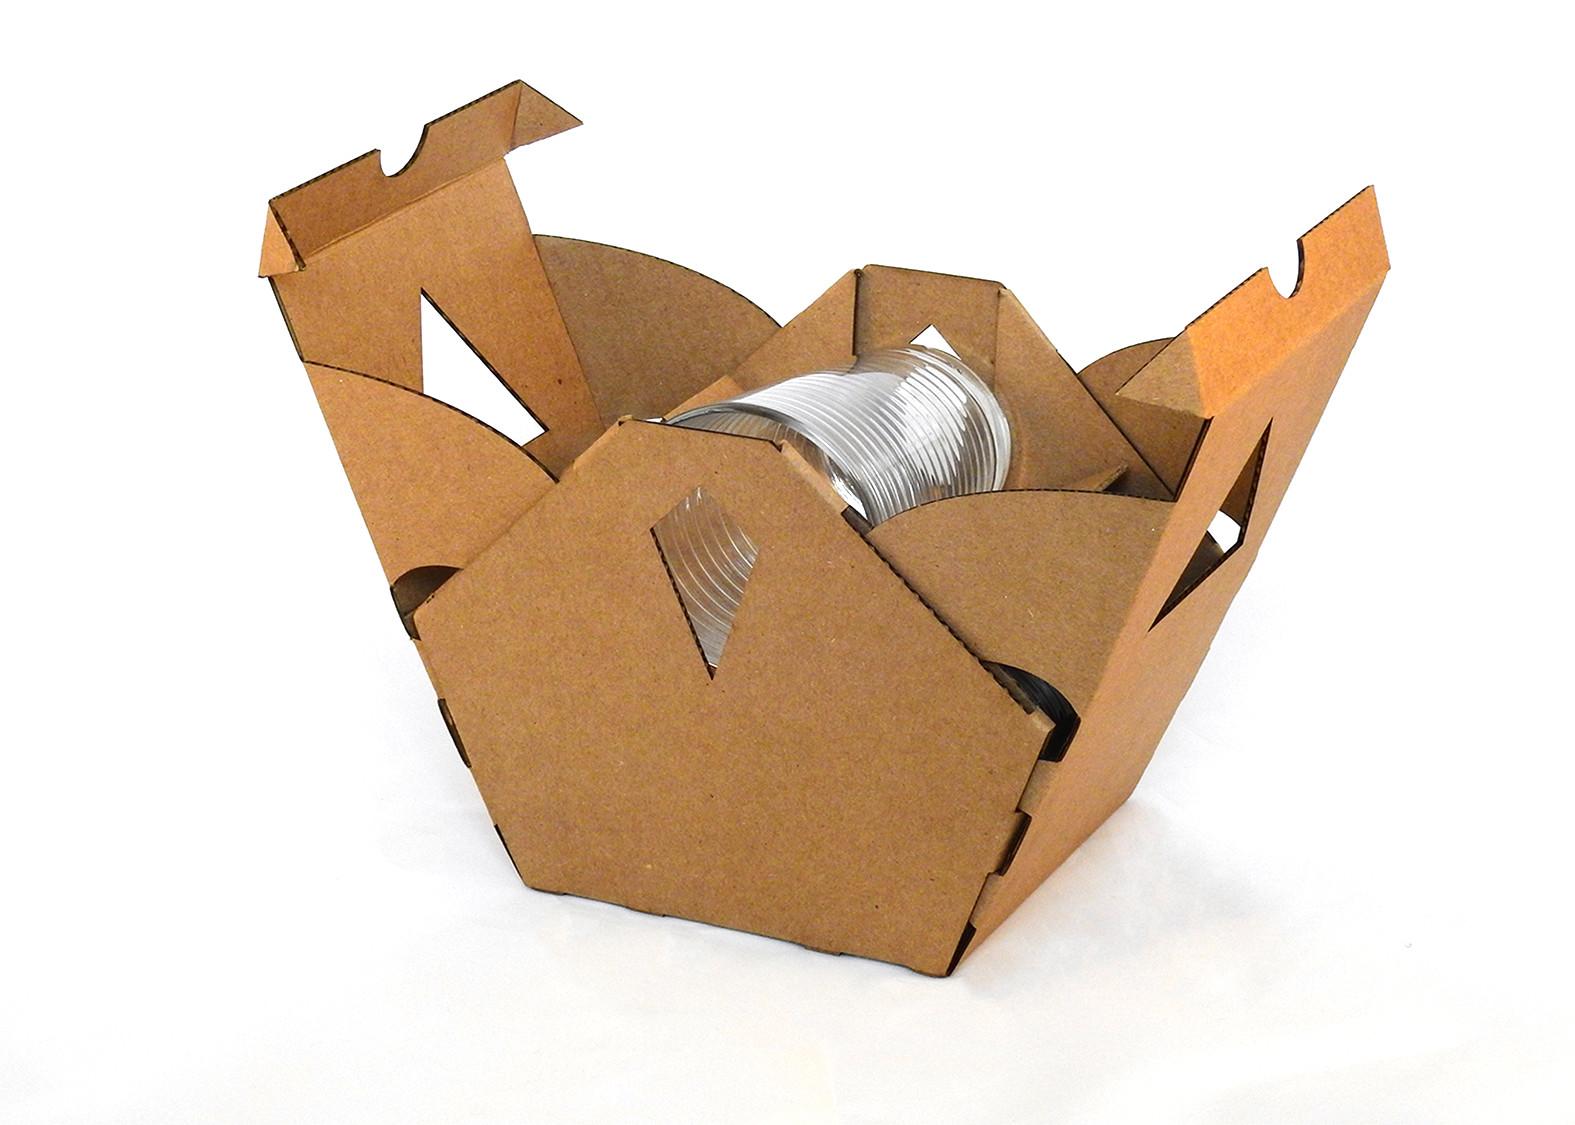 Cardboard Box Project